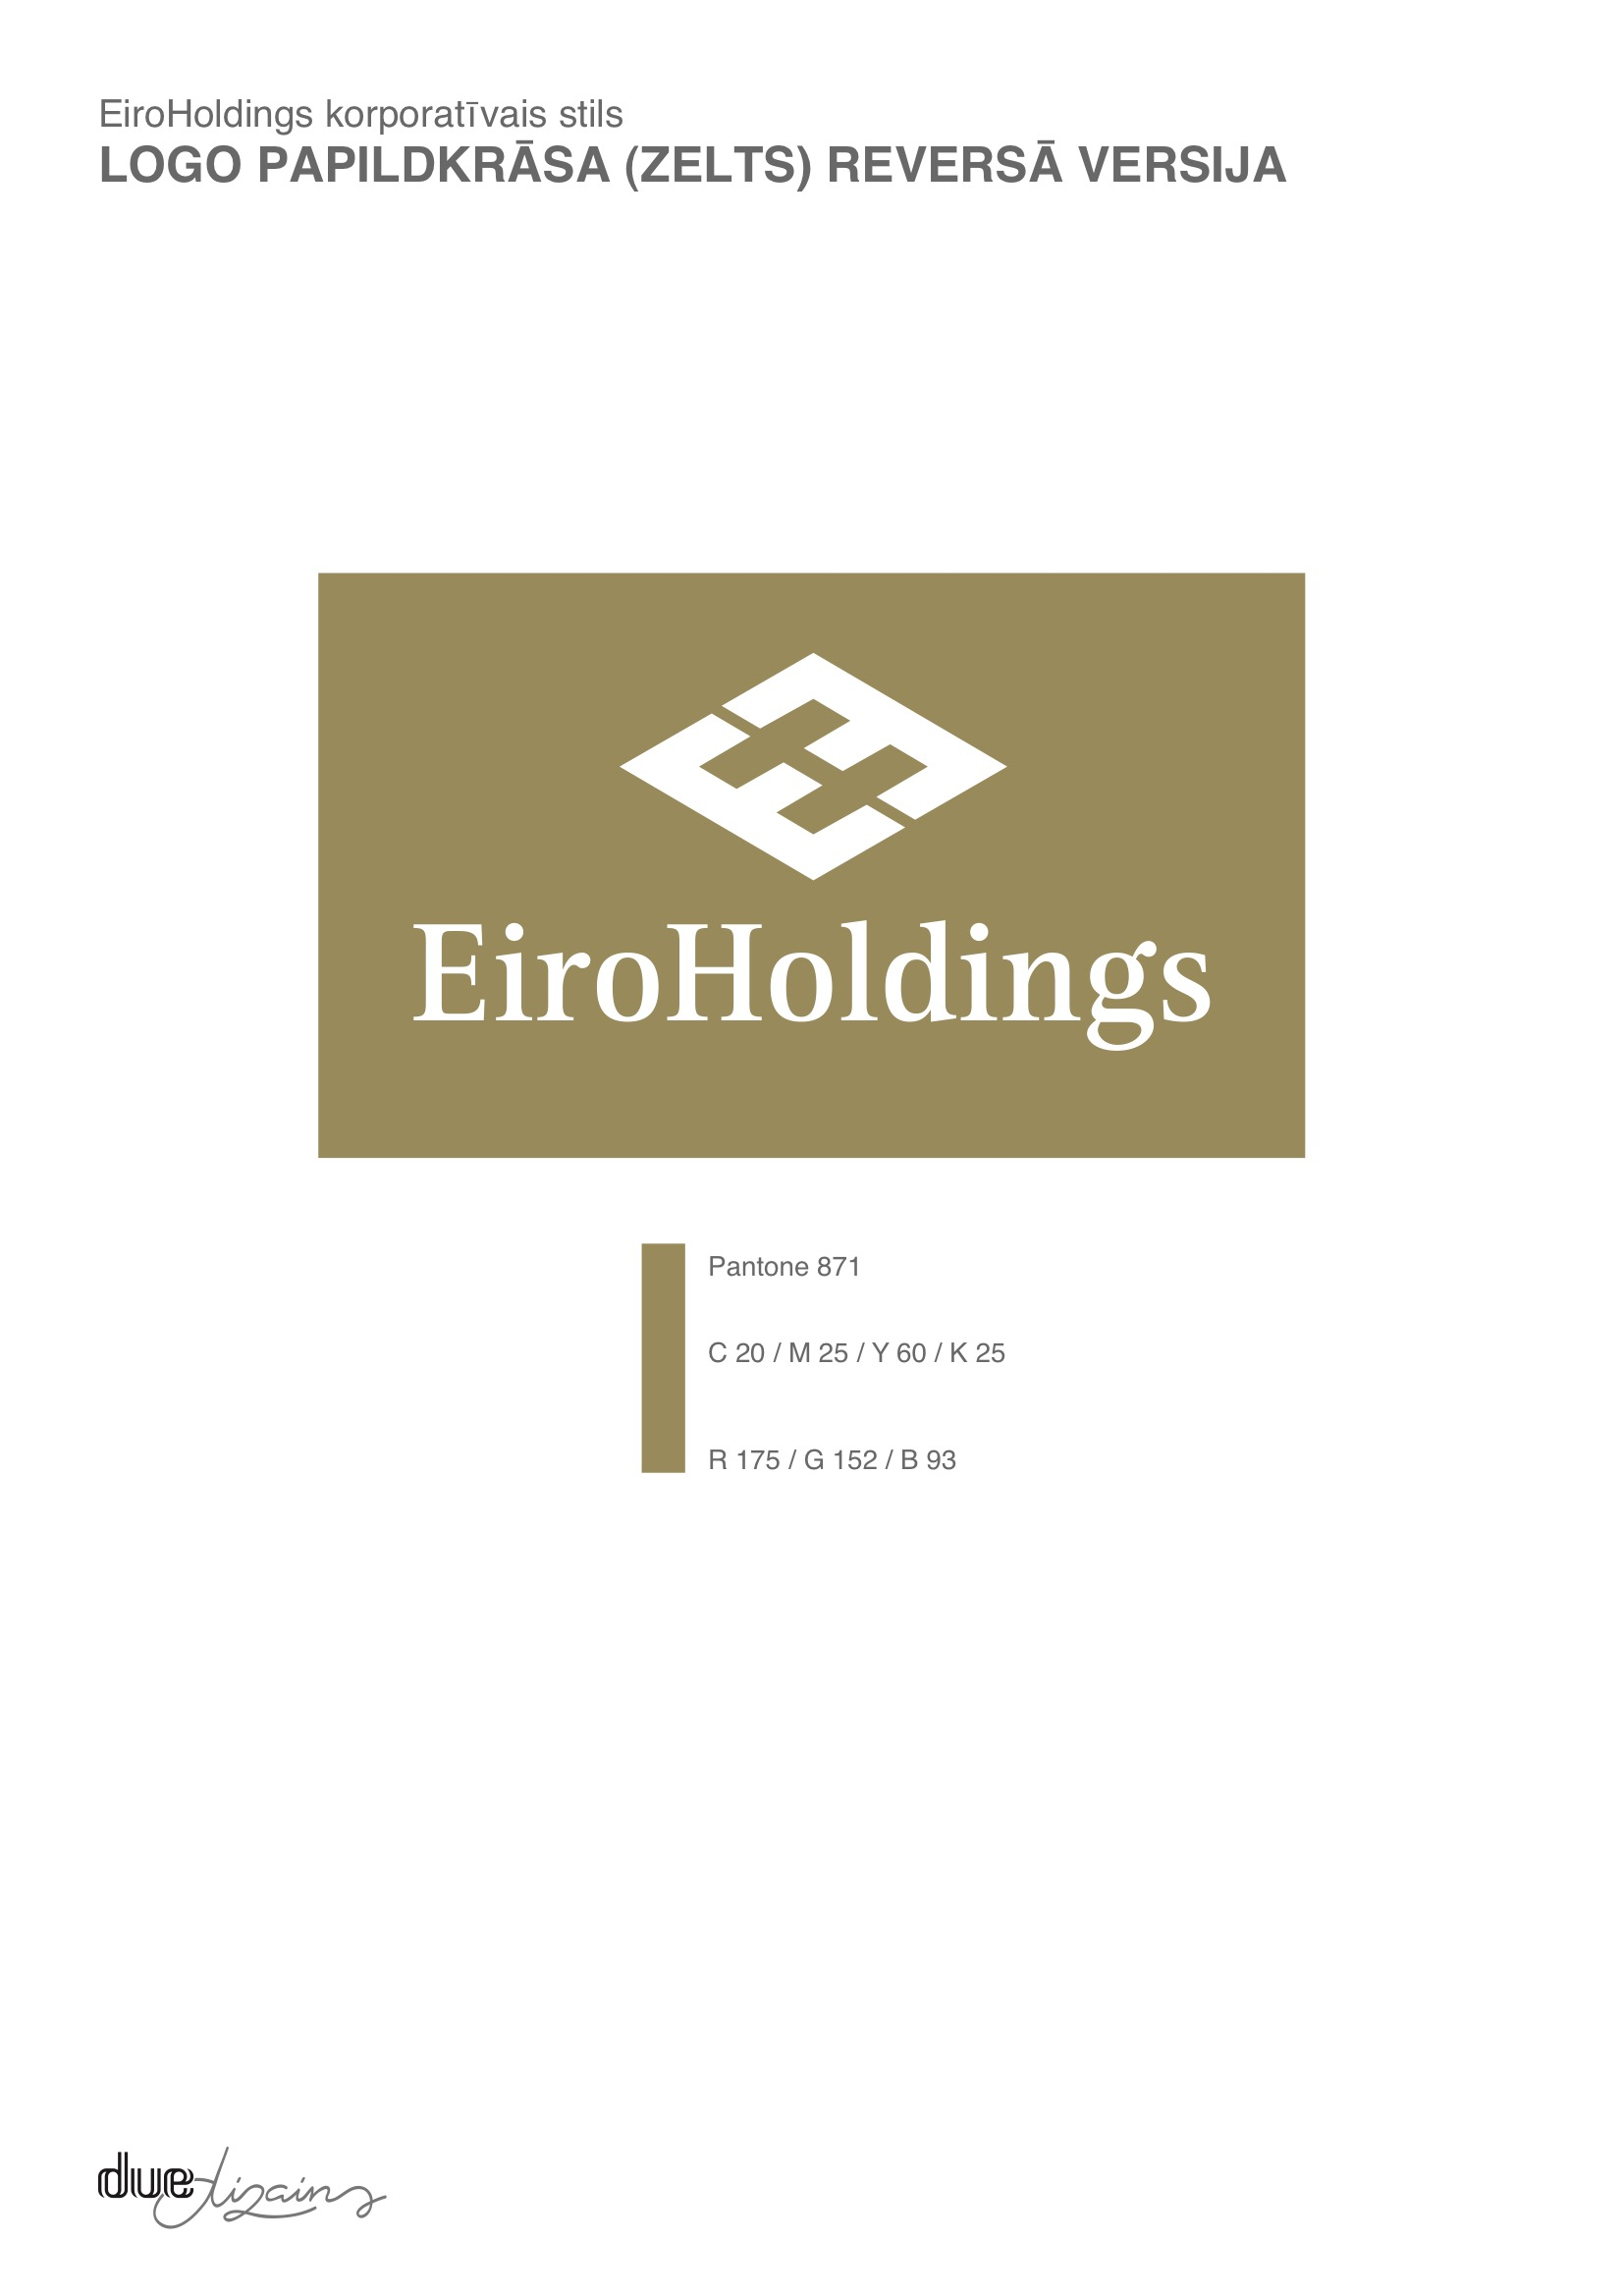 Eiroholdings_logo_guidelines 6